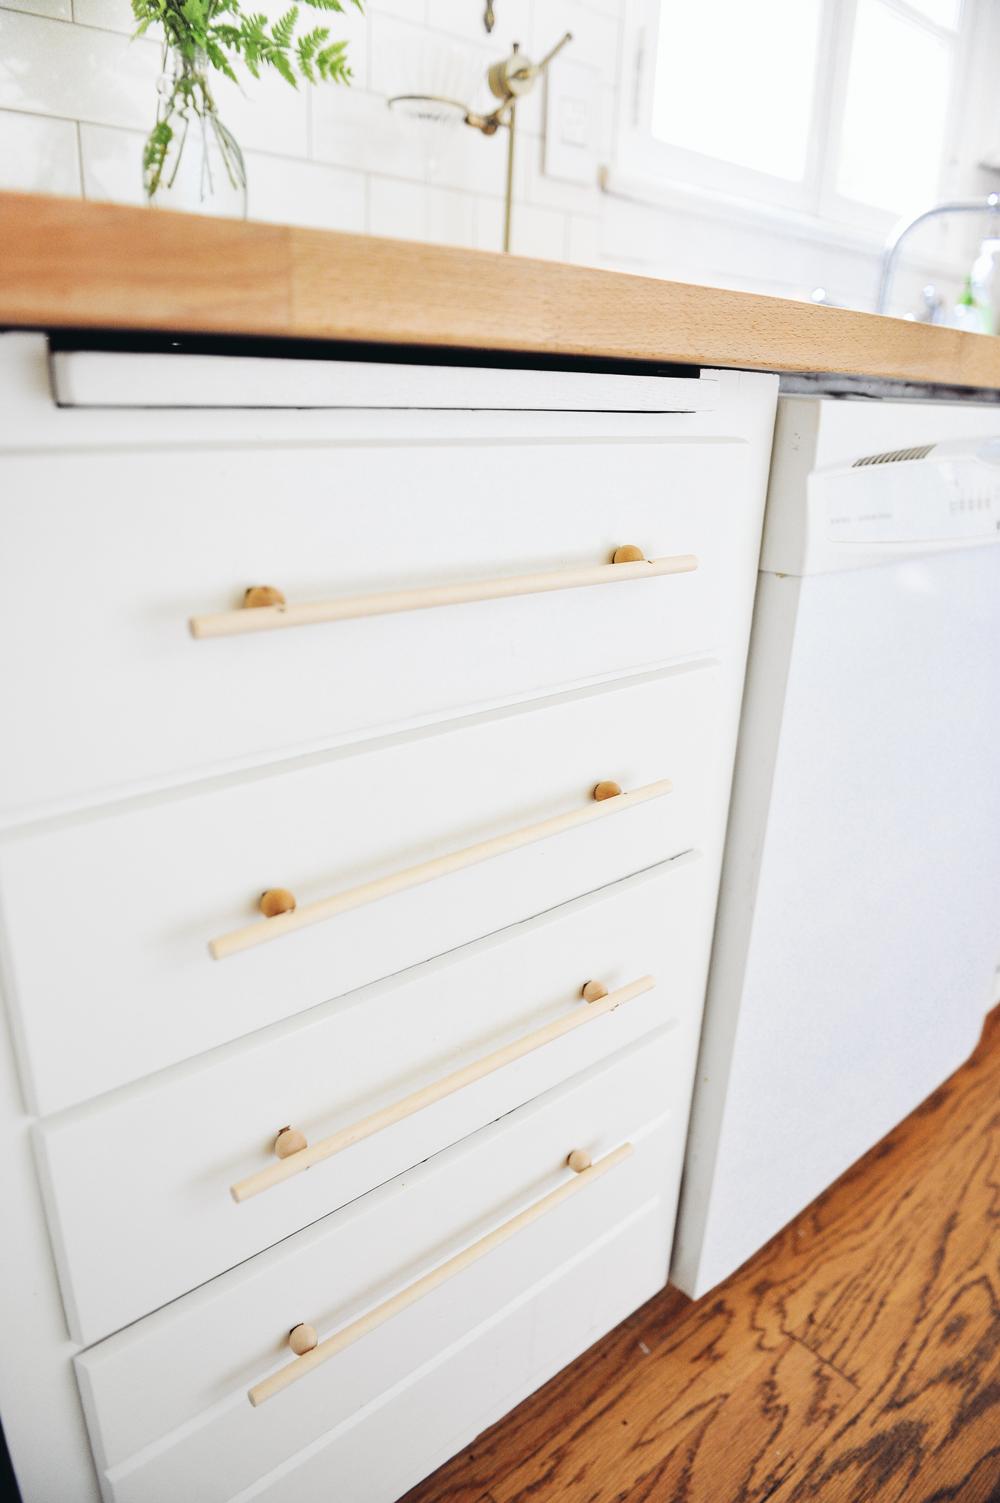 DIY Modern Wood Cabinet Pulls Hardware